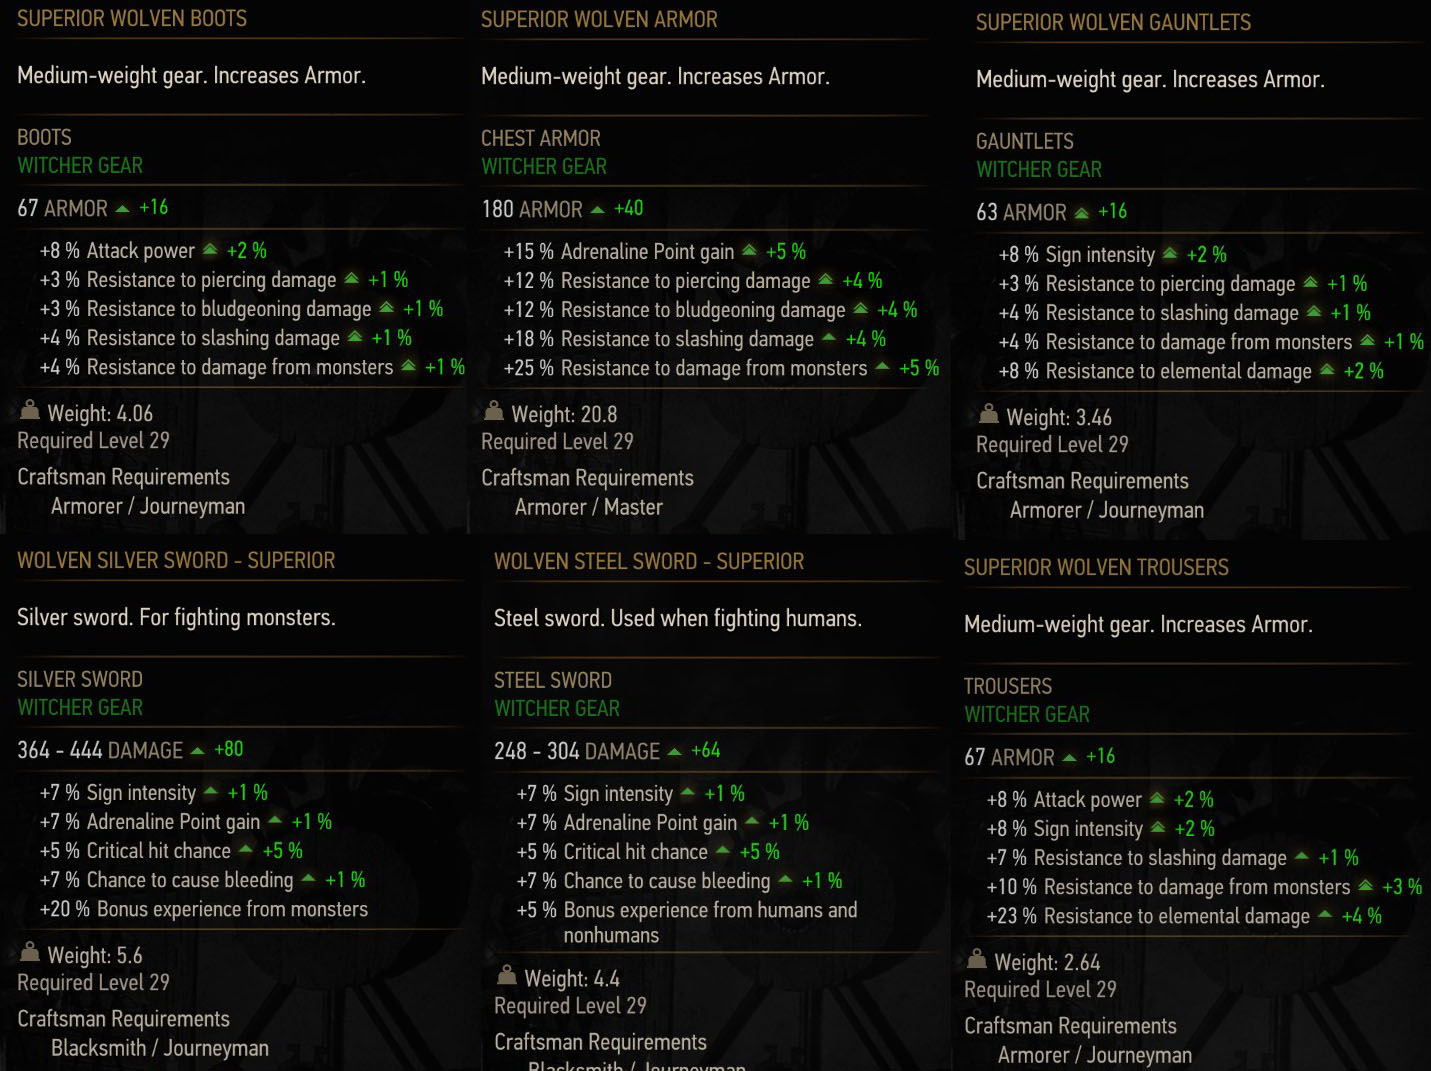 Witcher 3 Superior Wolf Gear Stats